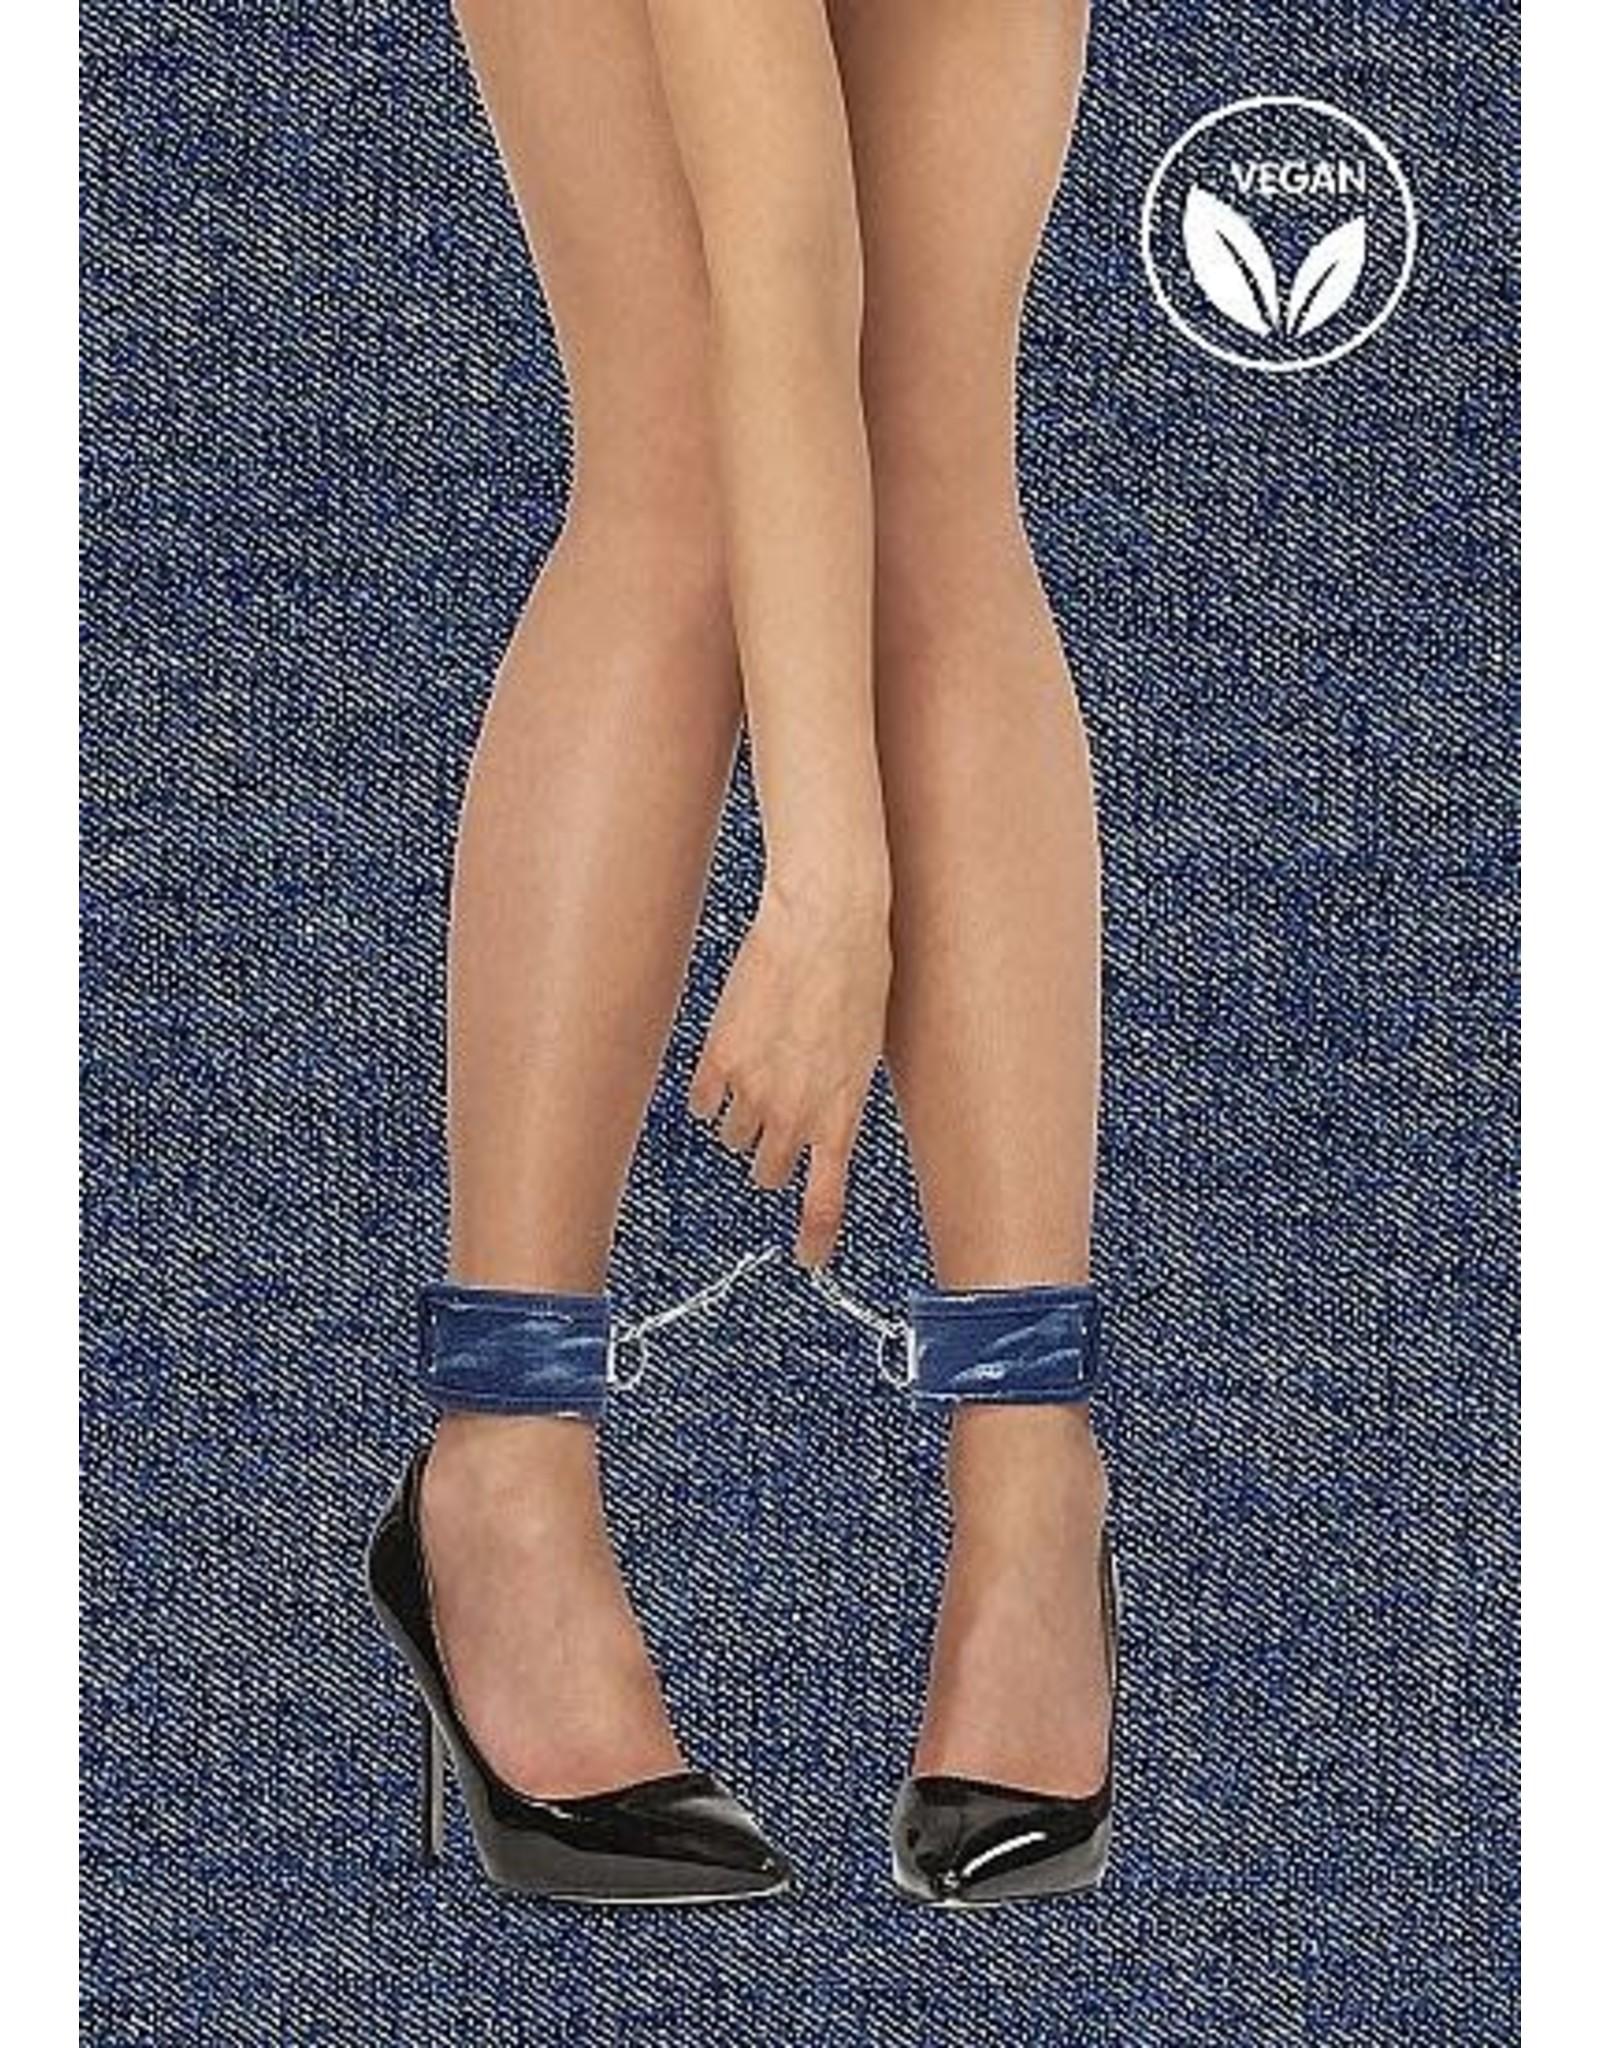 Ouch! Denim Ankle Cuffs - Roughend Denim Style - Blue